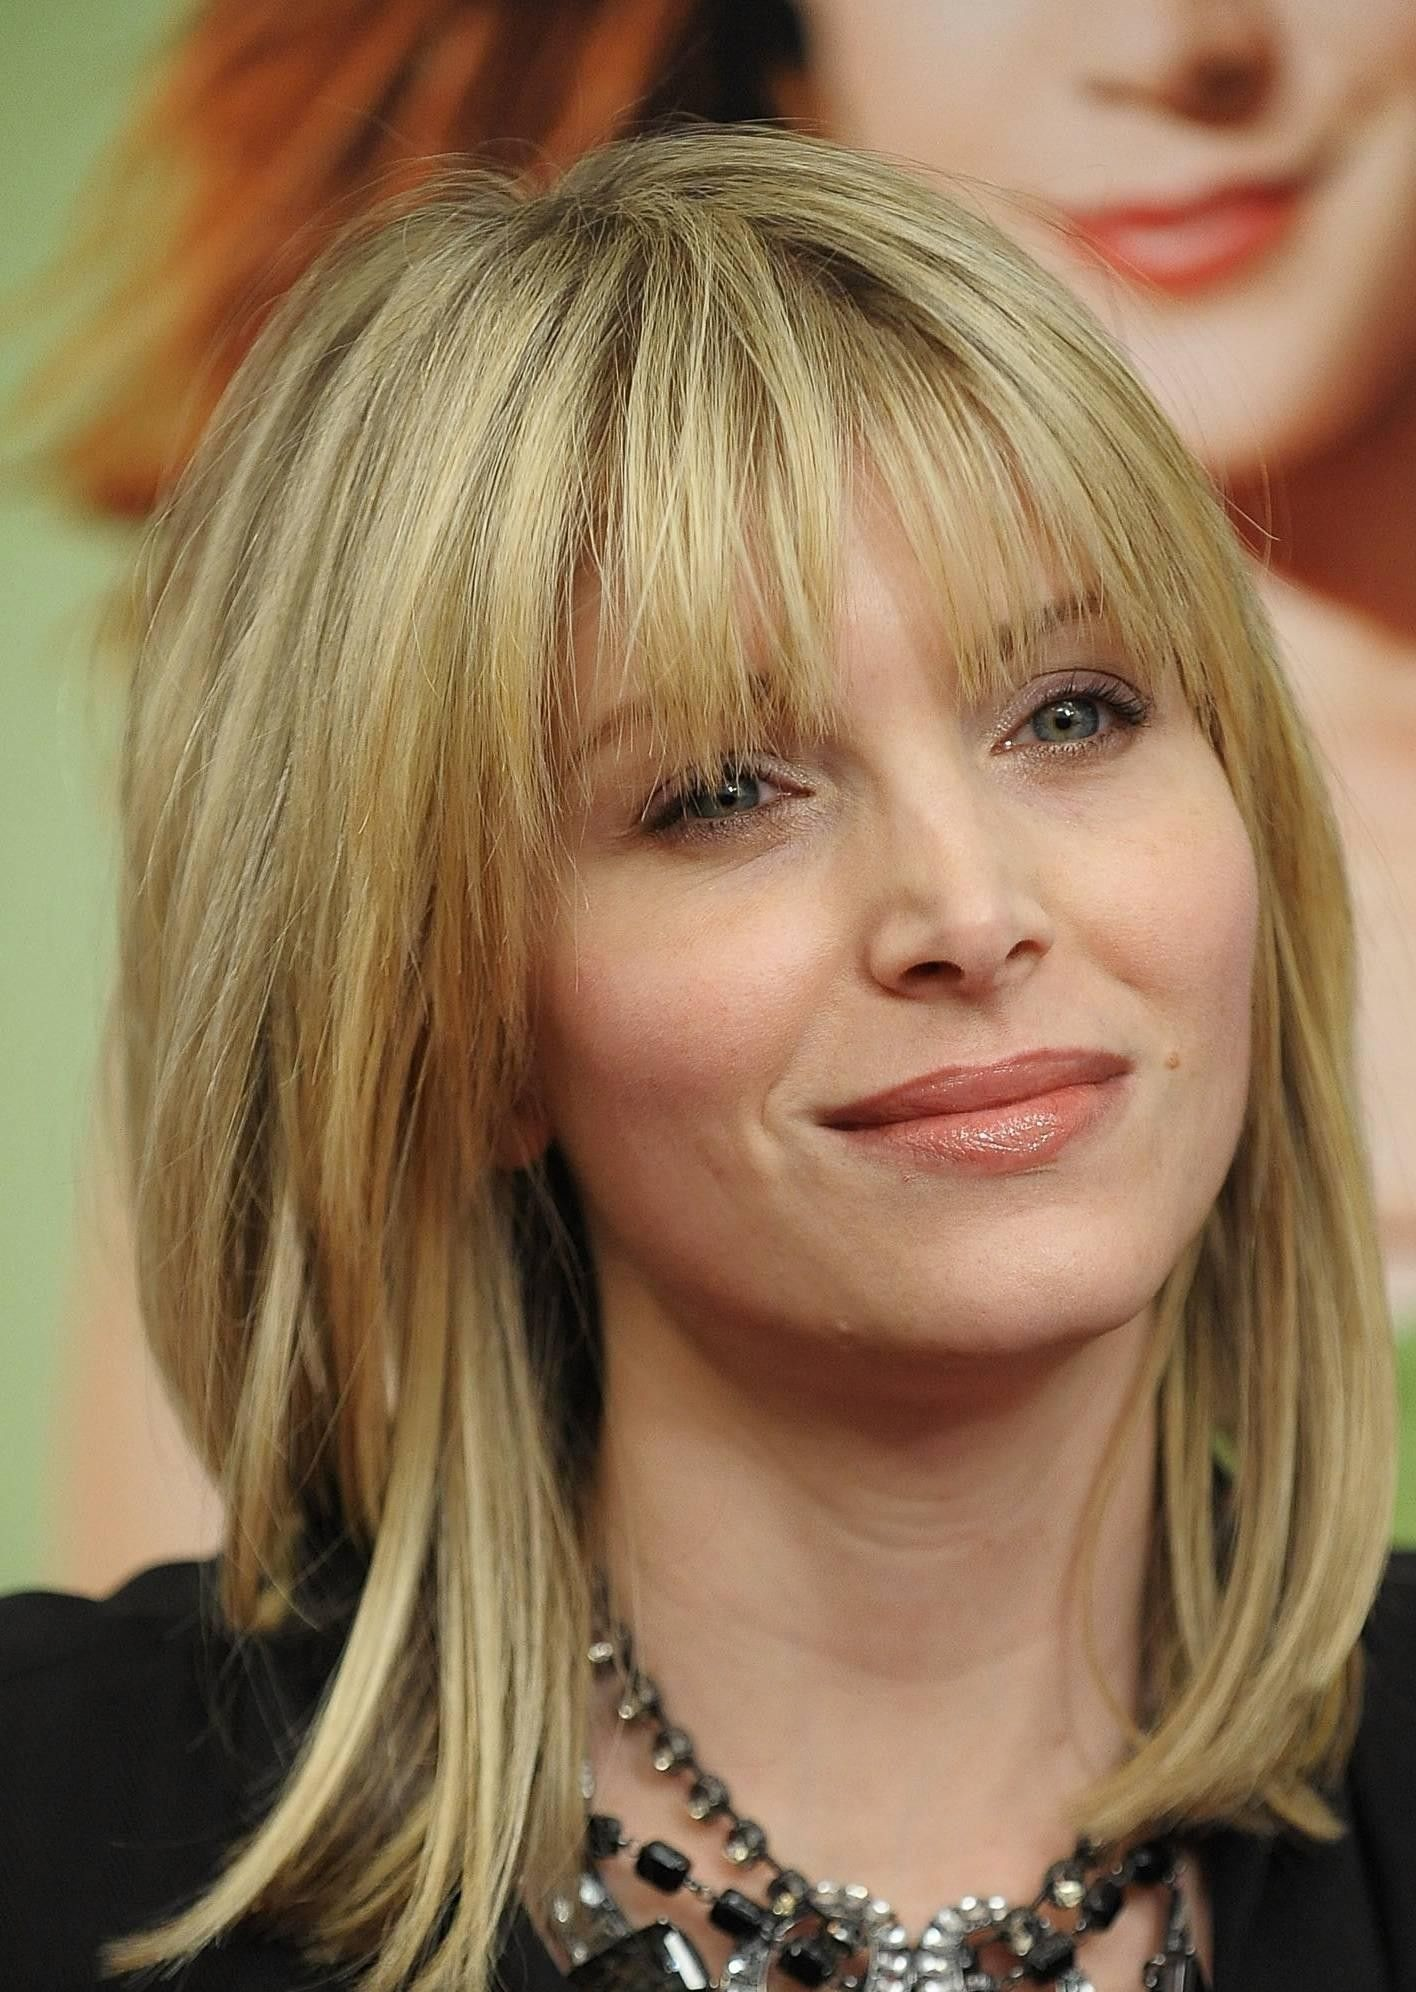 Mid length hairstyles women over 40 - 2014 Medium Hair Styles For Women Over 40 2014 Easy Hairstyles For Women Over 40 Popular Haircuts